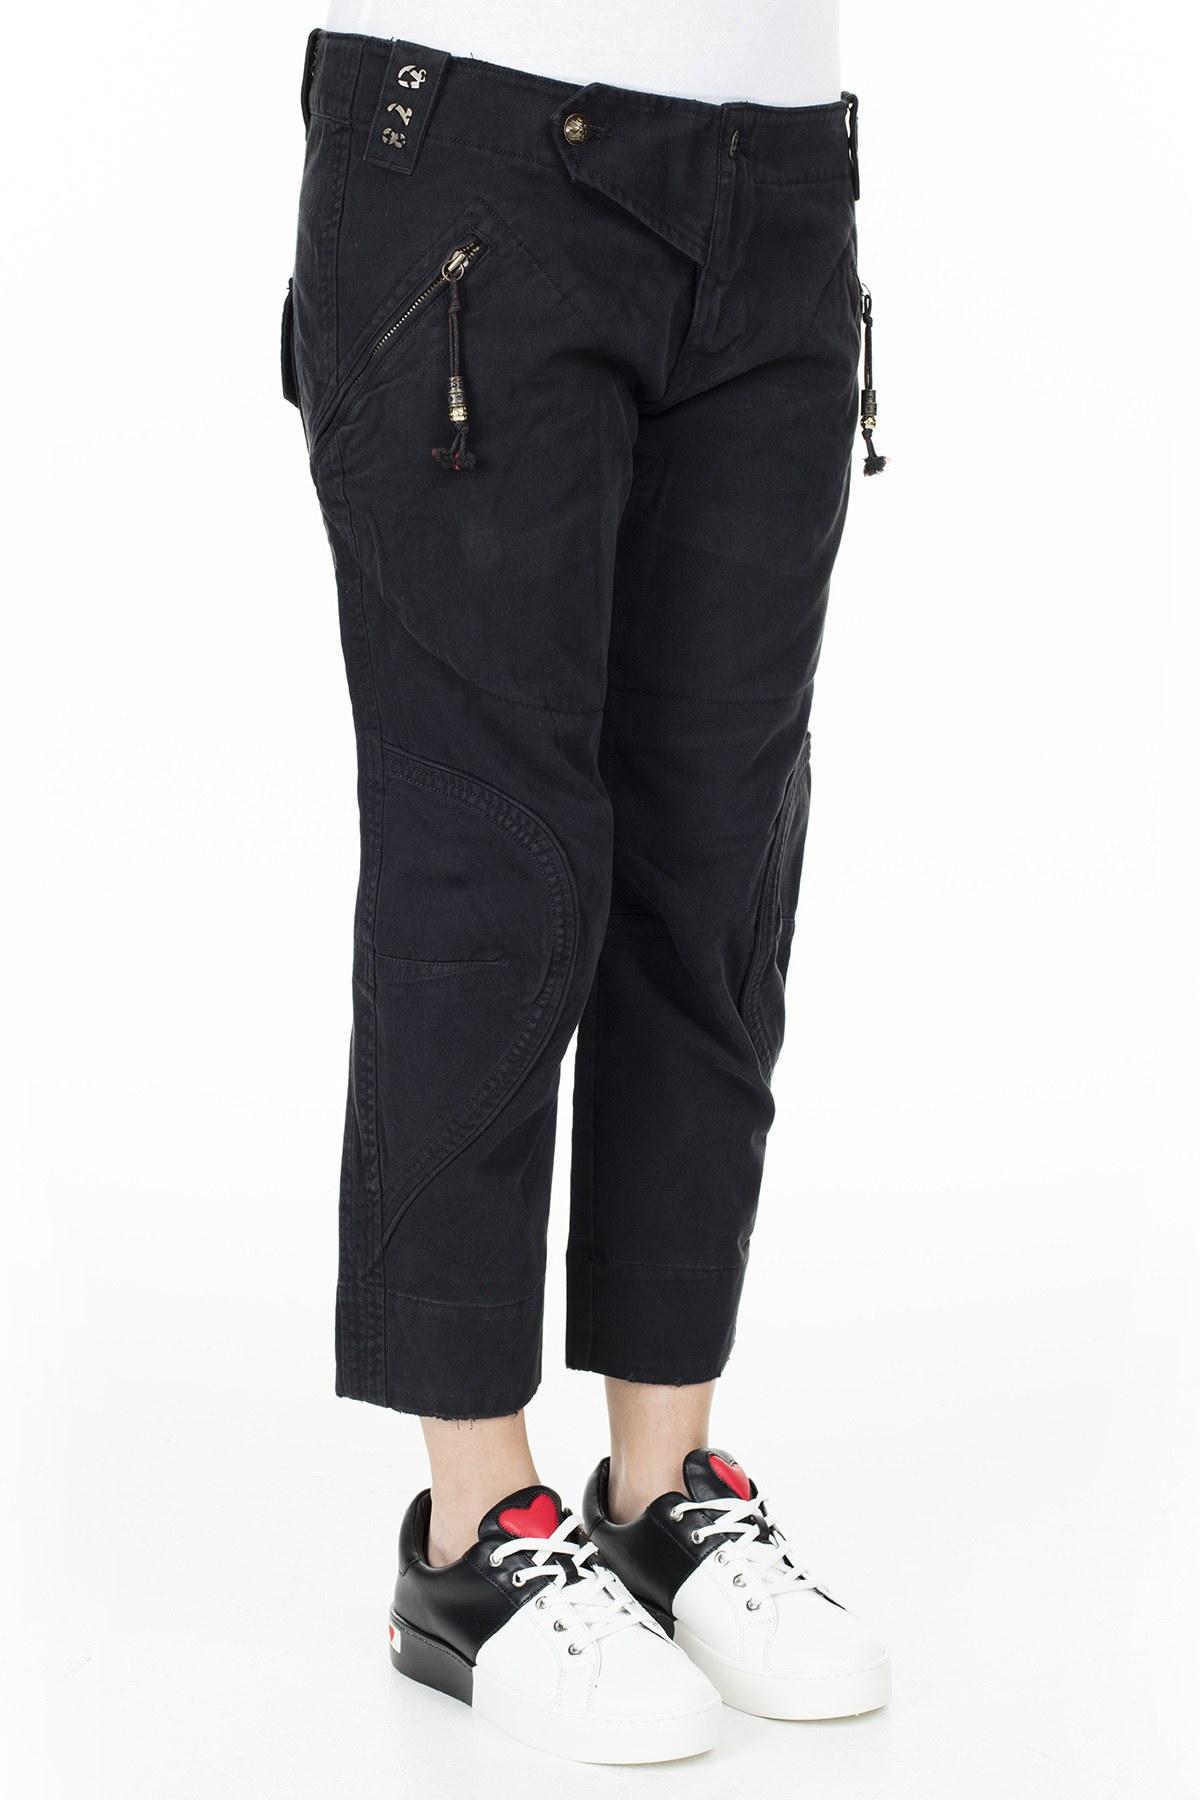 Diesel Jeans Bayan Kot Pantolon ZOXAASYHBY SİYAH